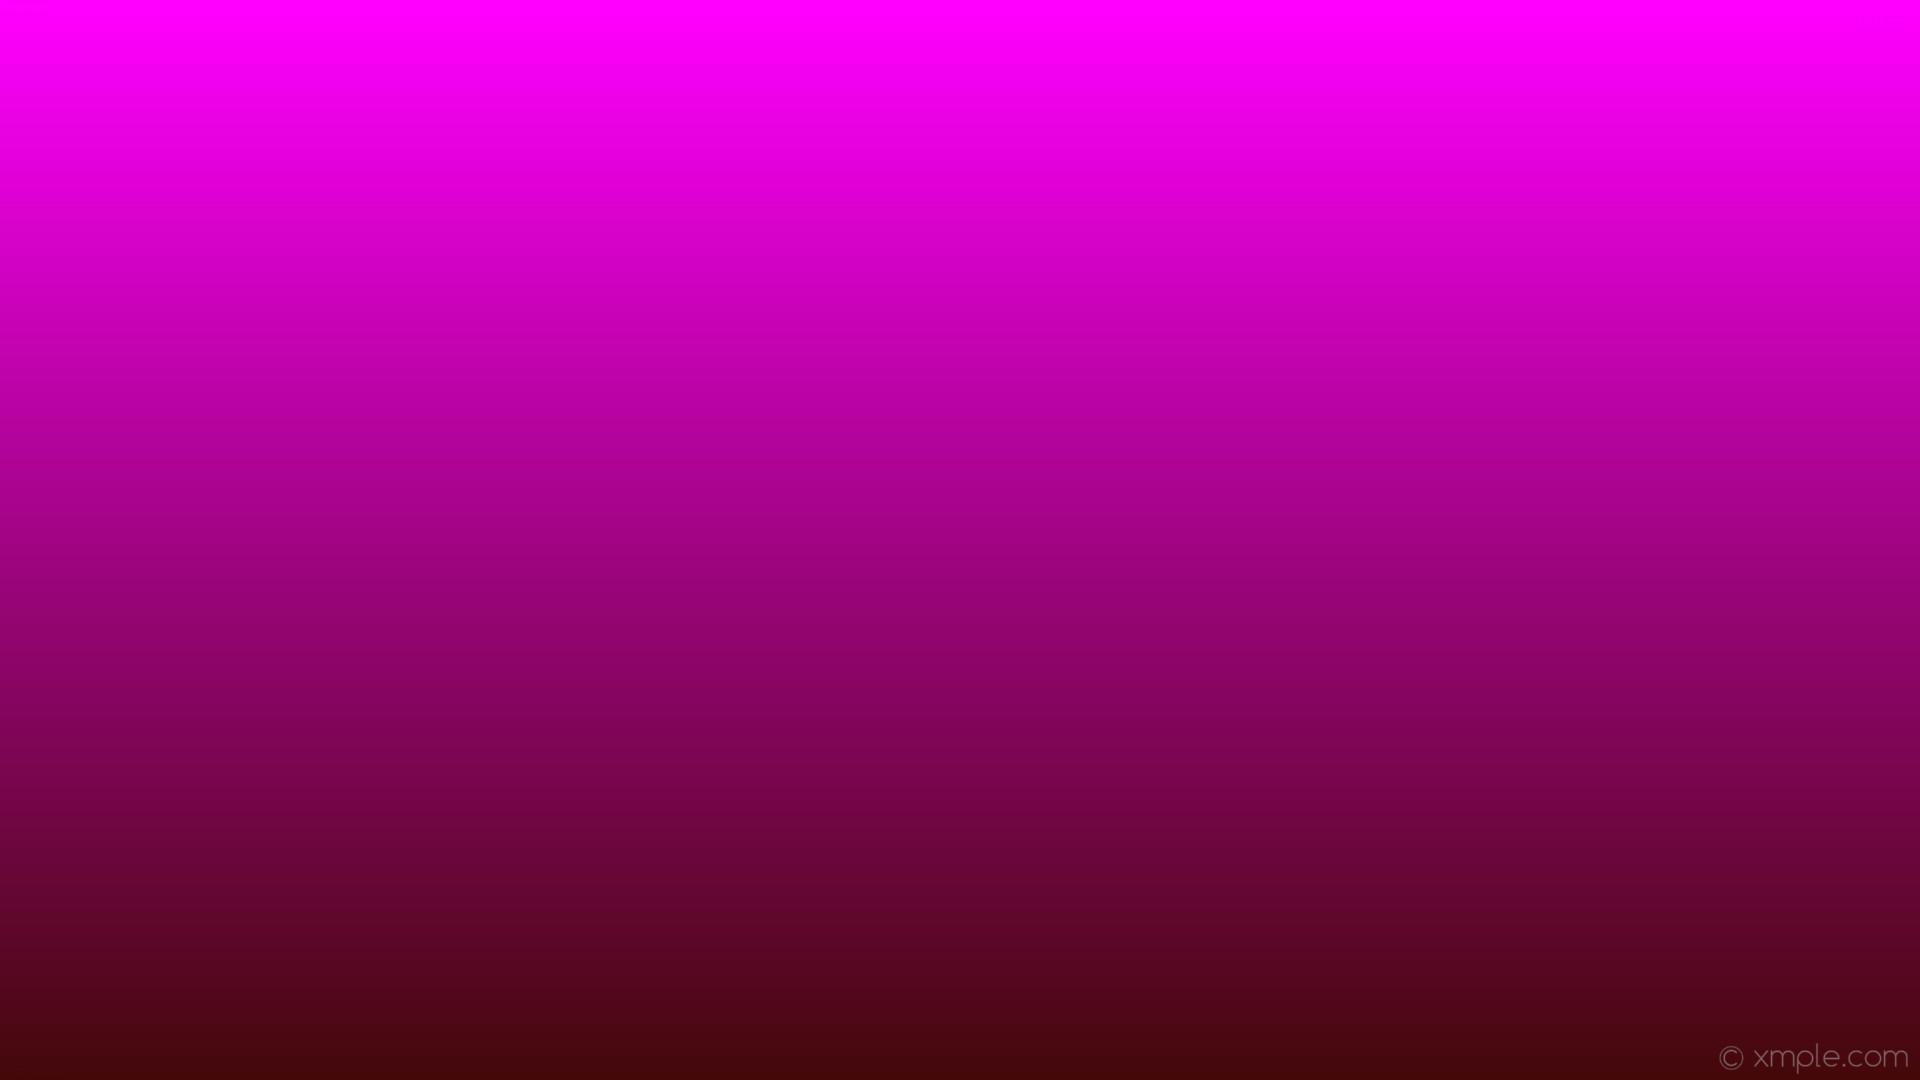 wallpaper gradient red purple linear dark red magenta #440809 #ff00ff 270°